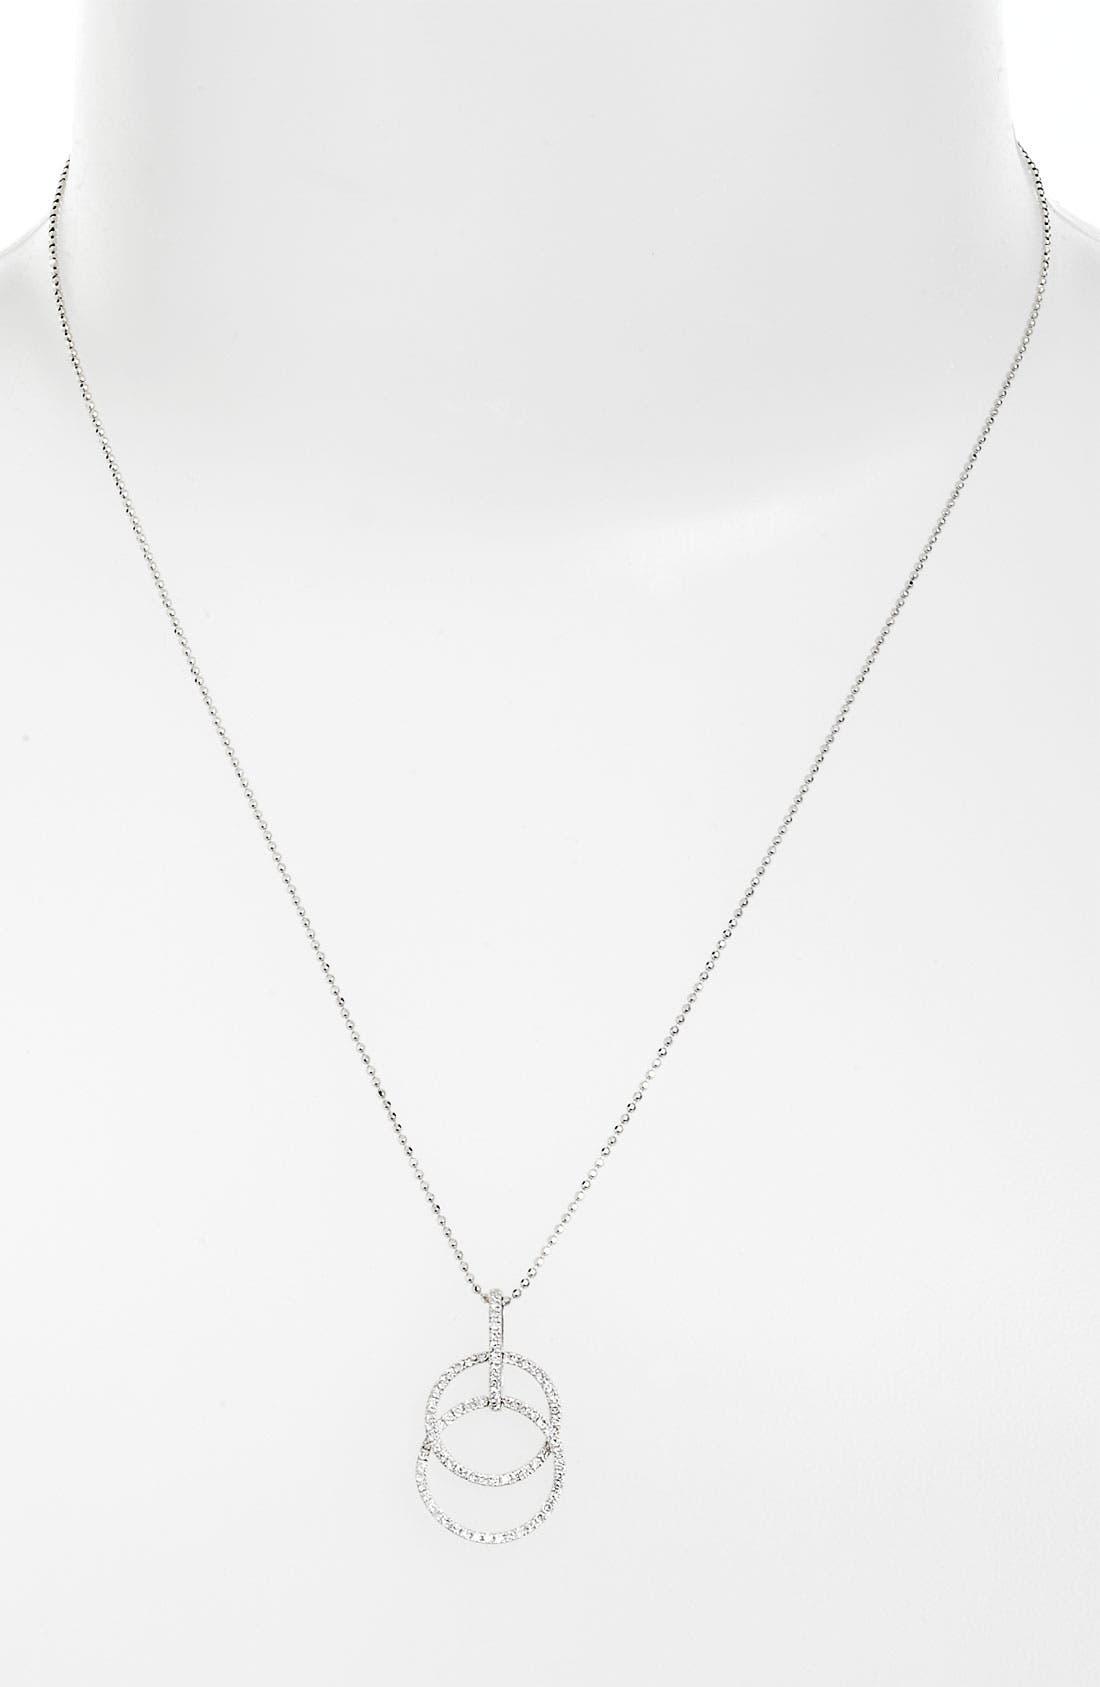 Main Image - Bony Levy 'Circle Links' Diamond Pendant Necklace (Nordstrom Exclusive)